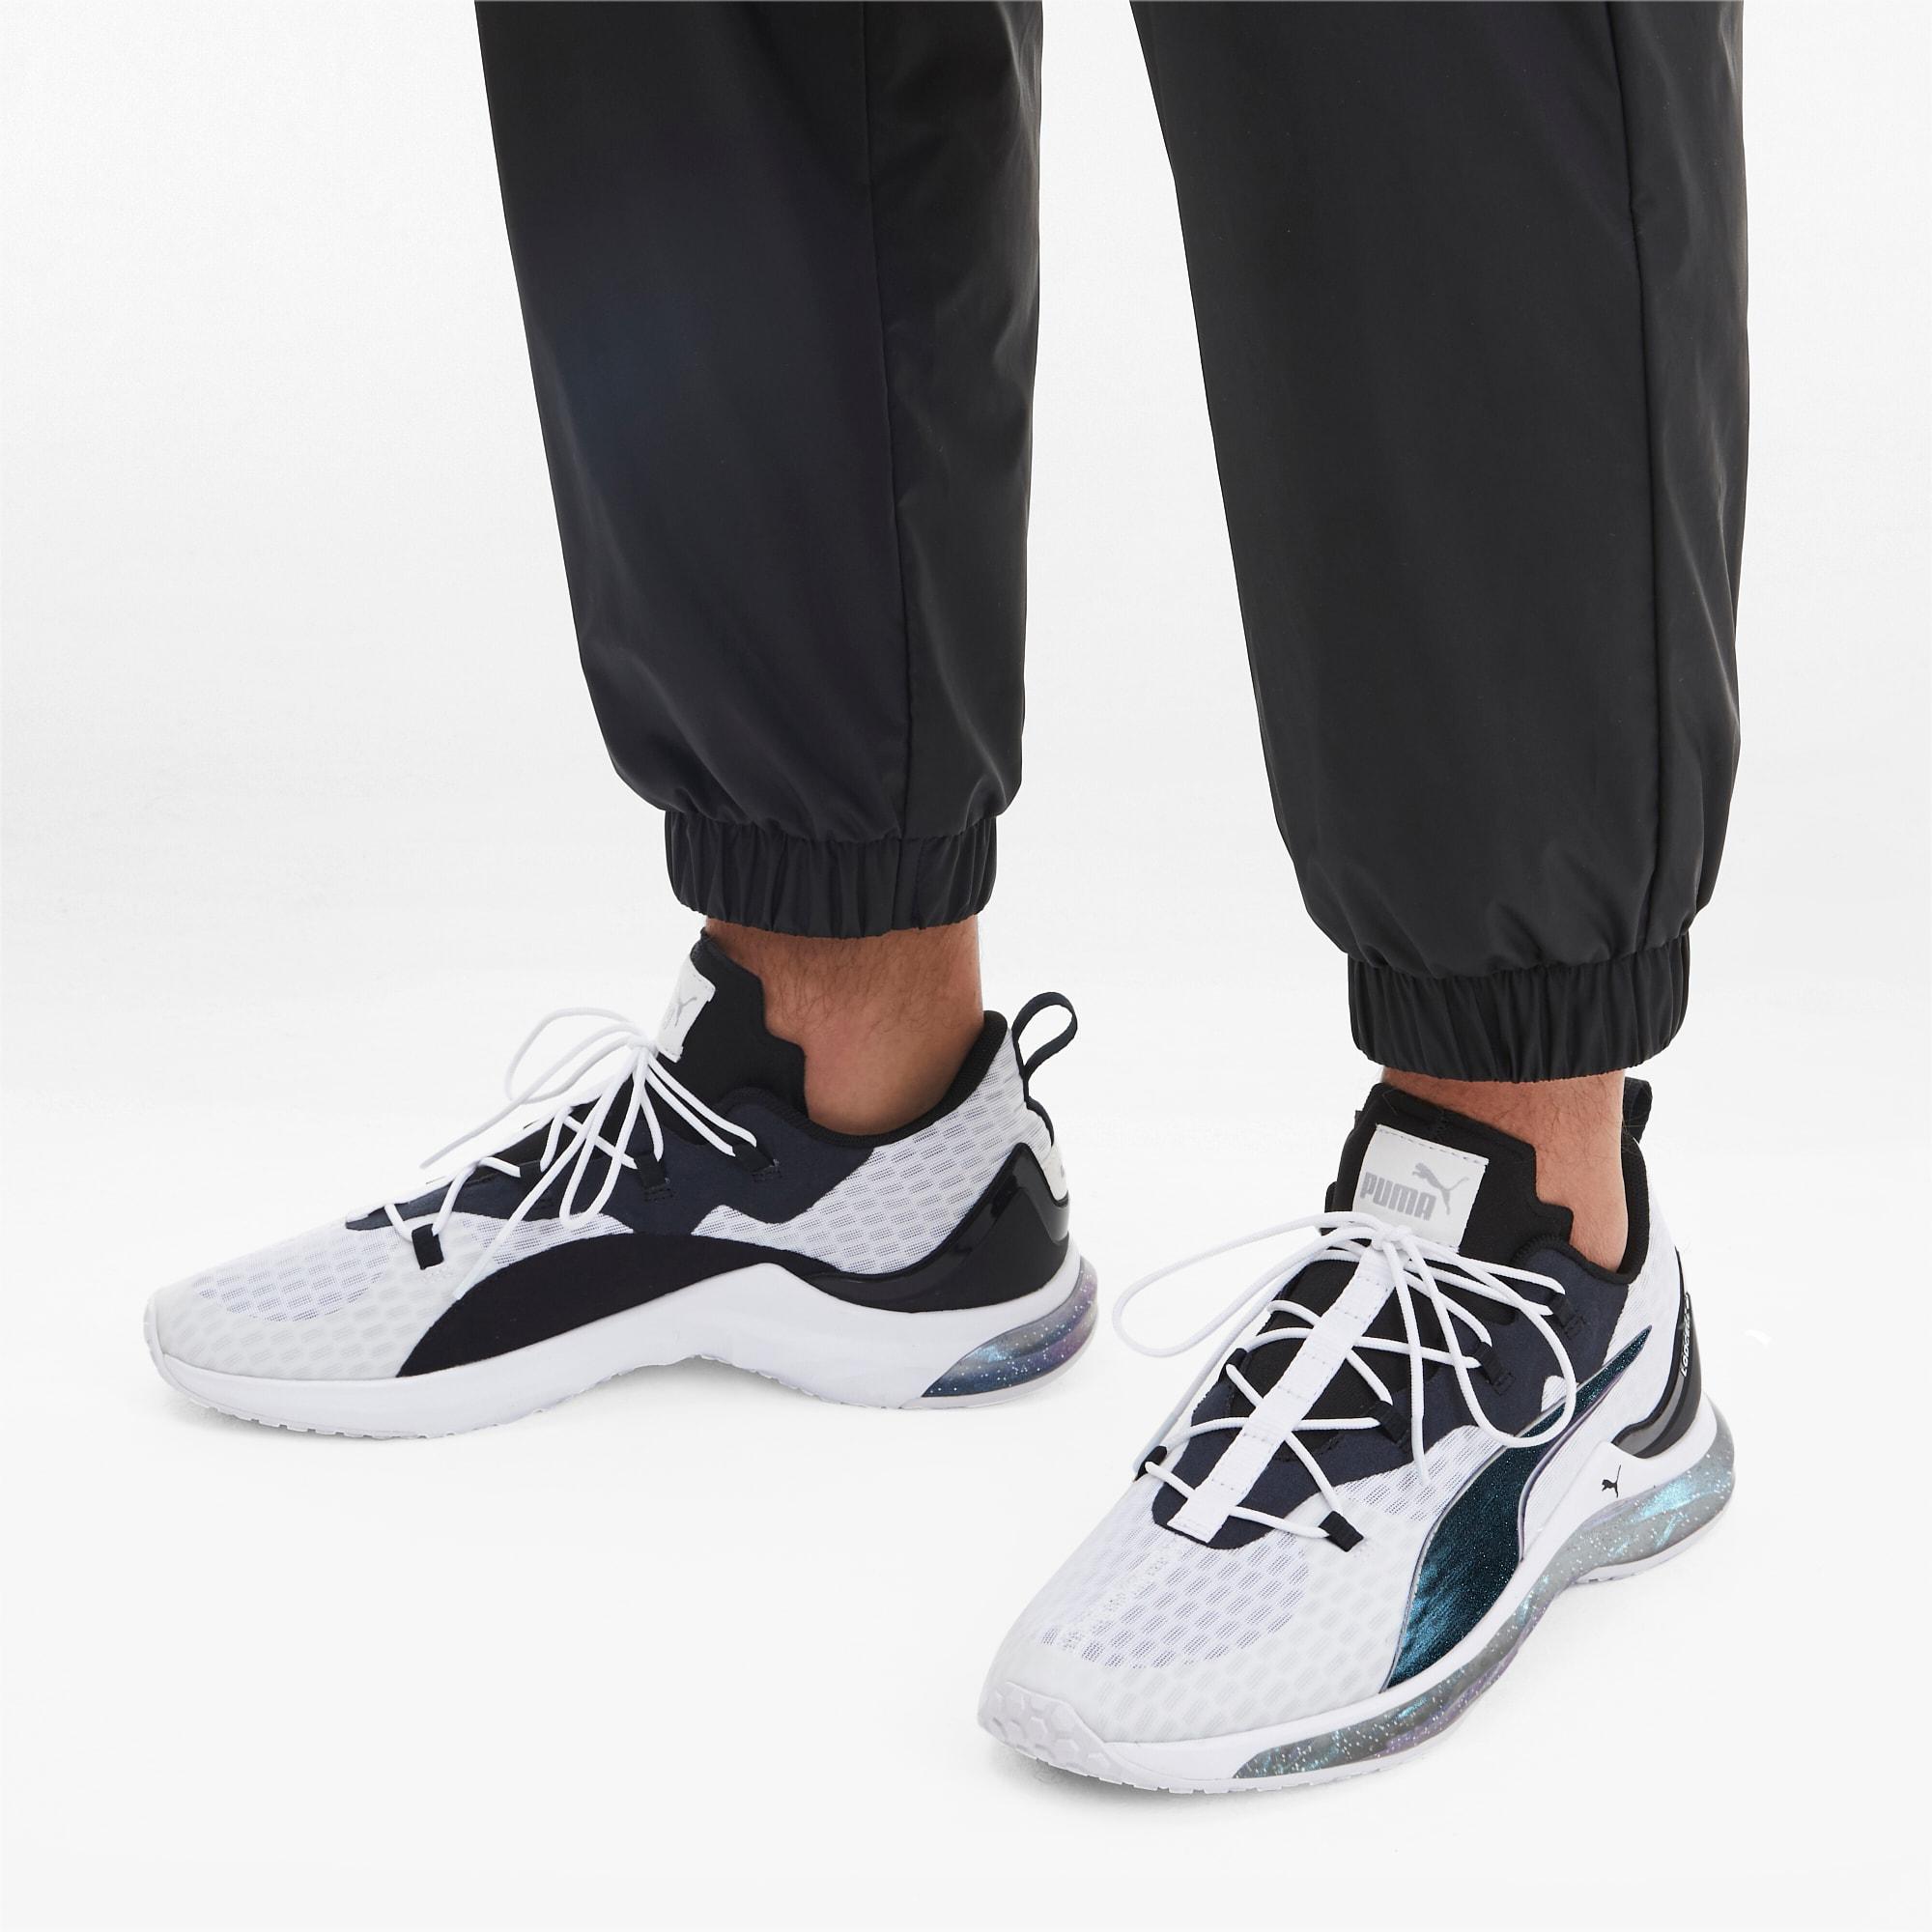 LQDCELL Hydra Iridescent Men's Training Shoes